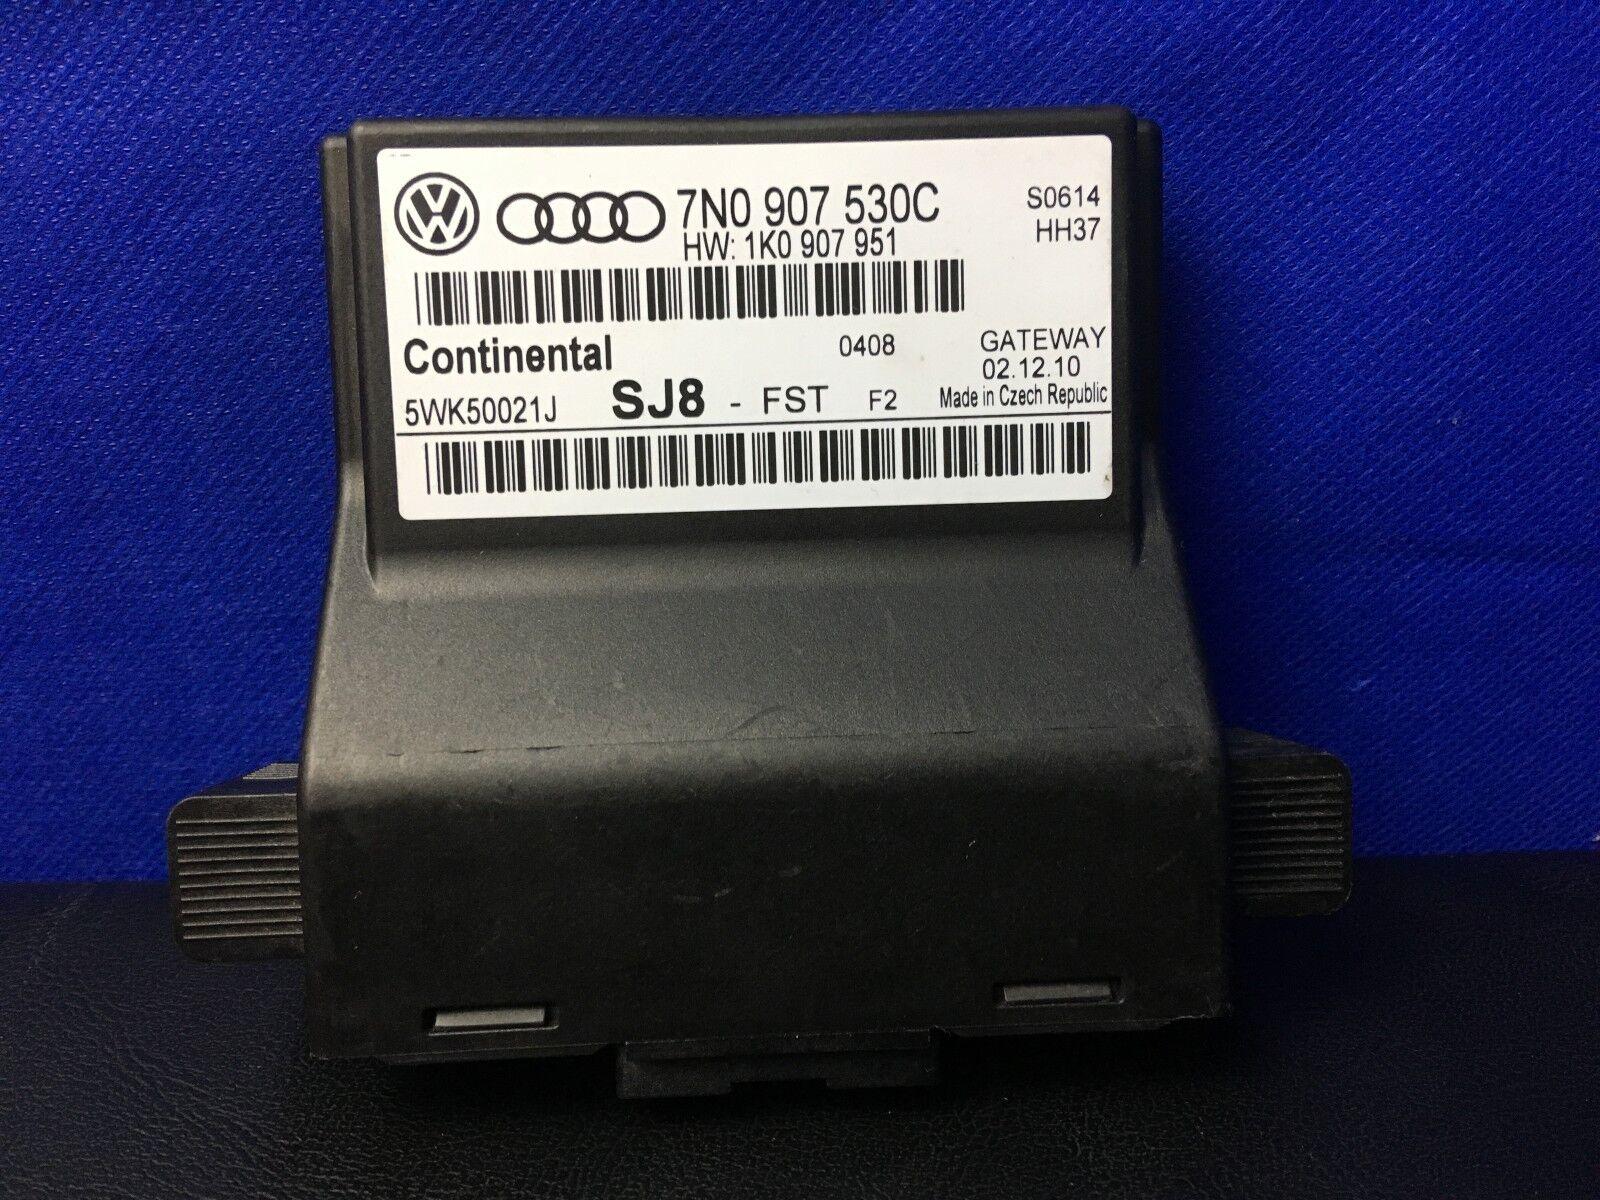 Original VW Gateway Interface Steuergerät Continental | 1K0907530F 7N0907530C